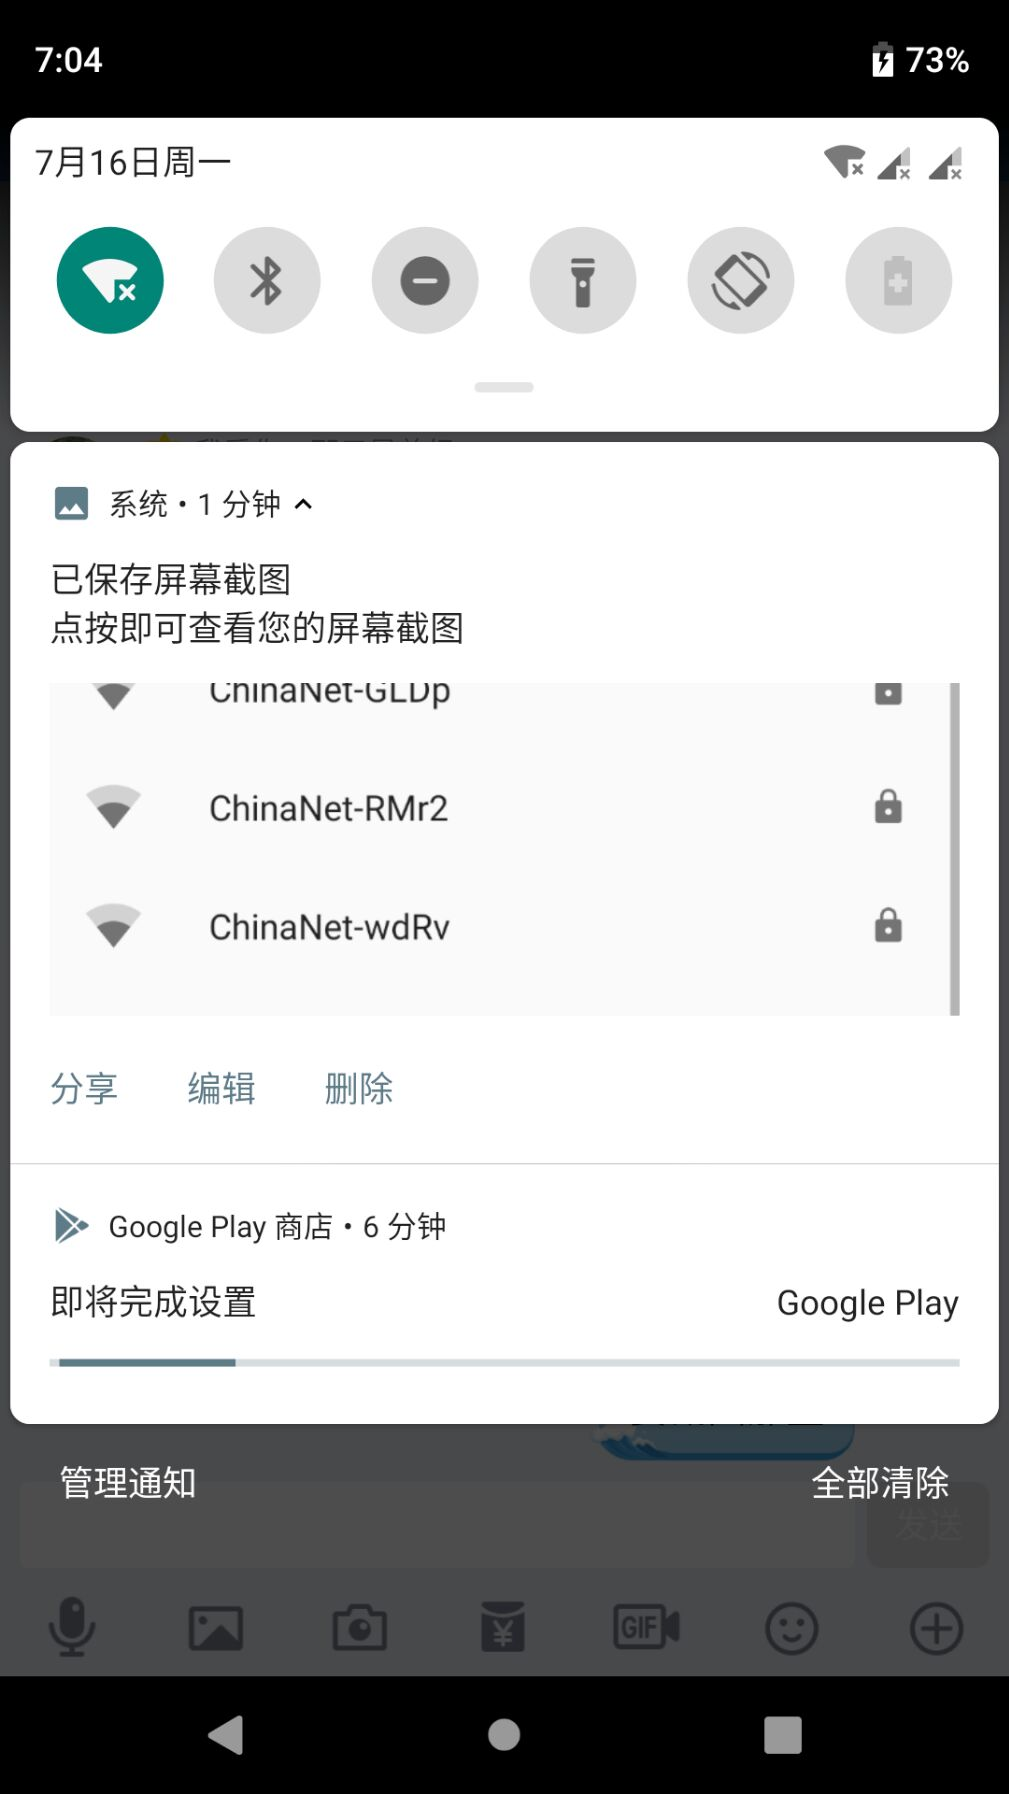 0807更新一加5/5T安装安卓9.0 Android P(Pie)正式版教程插图(2)